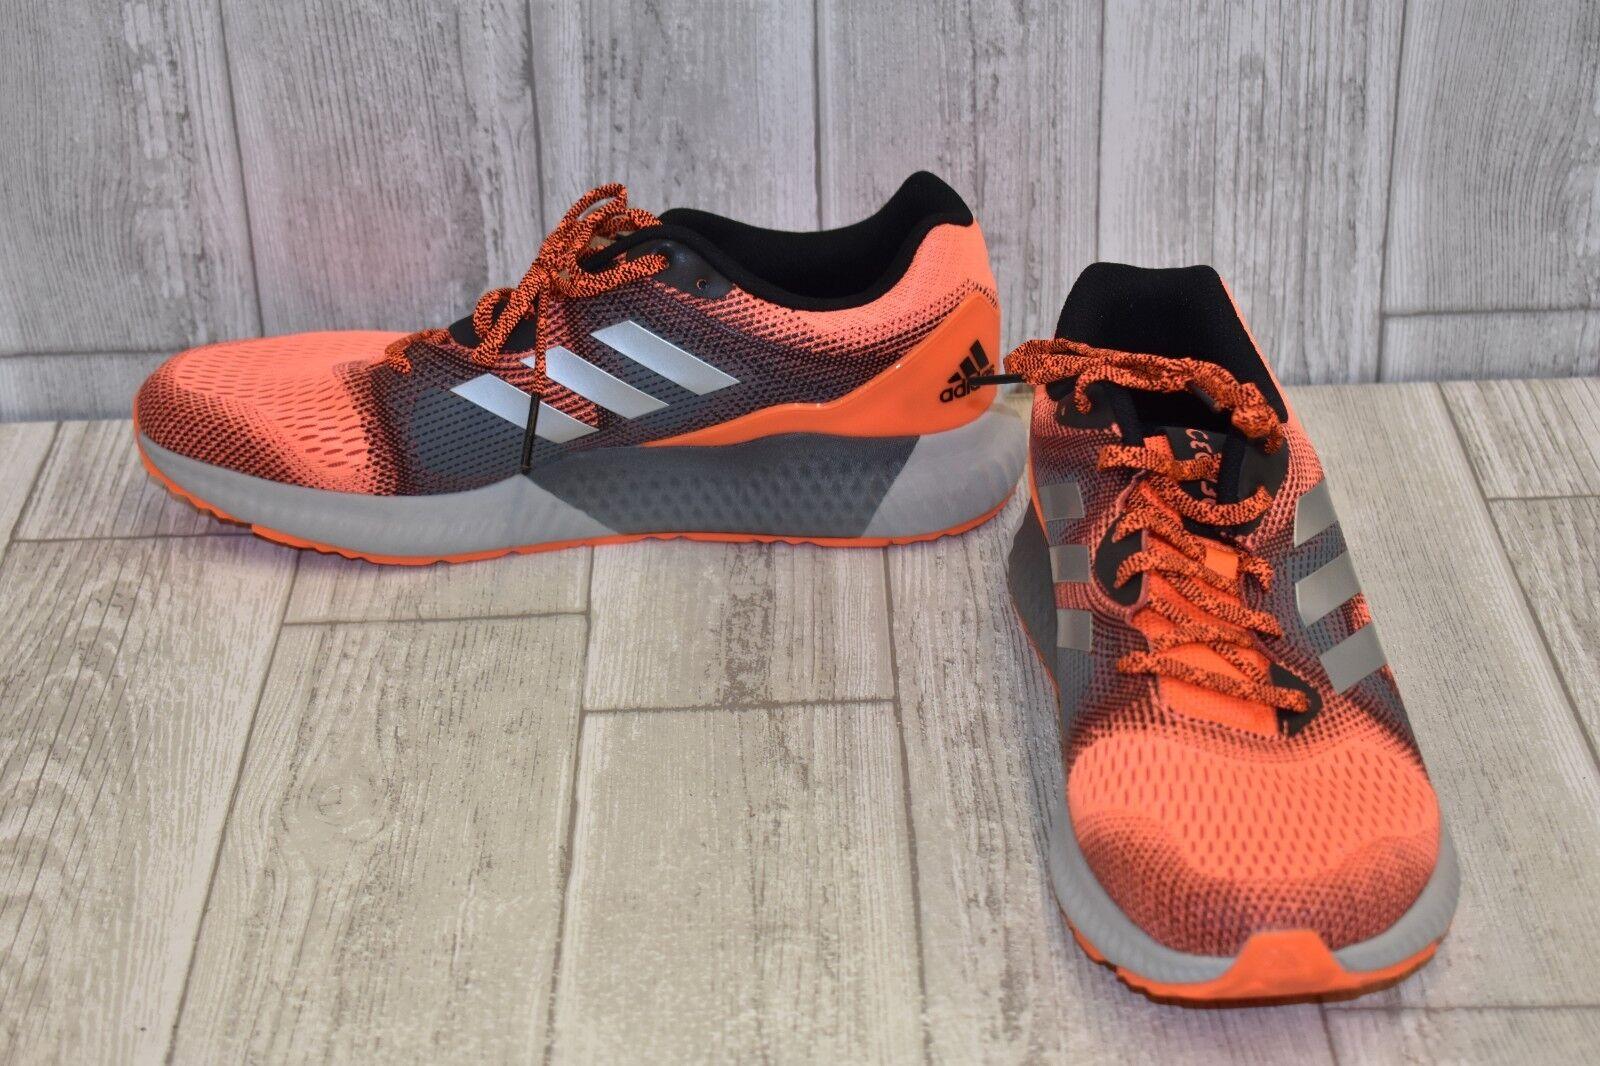 Adidas Running Aerobounce Running shoes-Men's size 11 orange